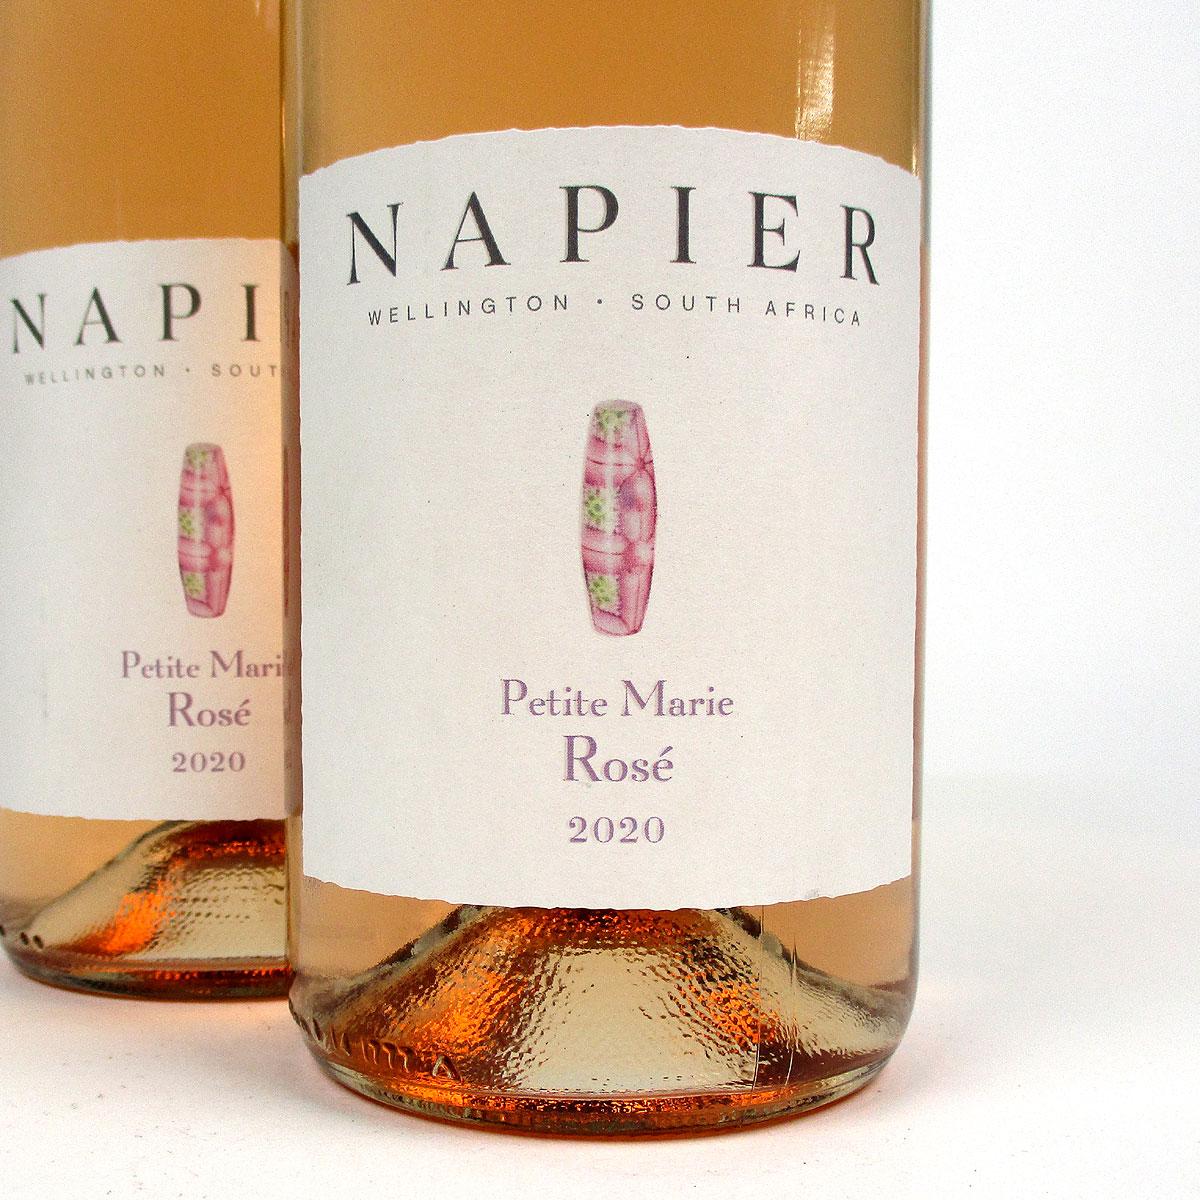 Napier Winery: 'Petite Marie' Rosé 2020